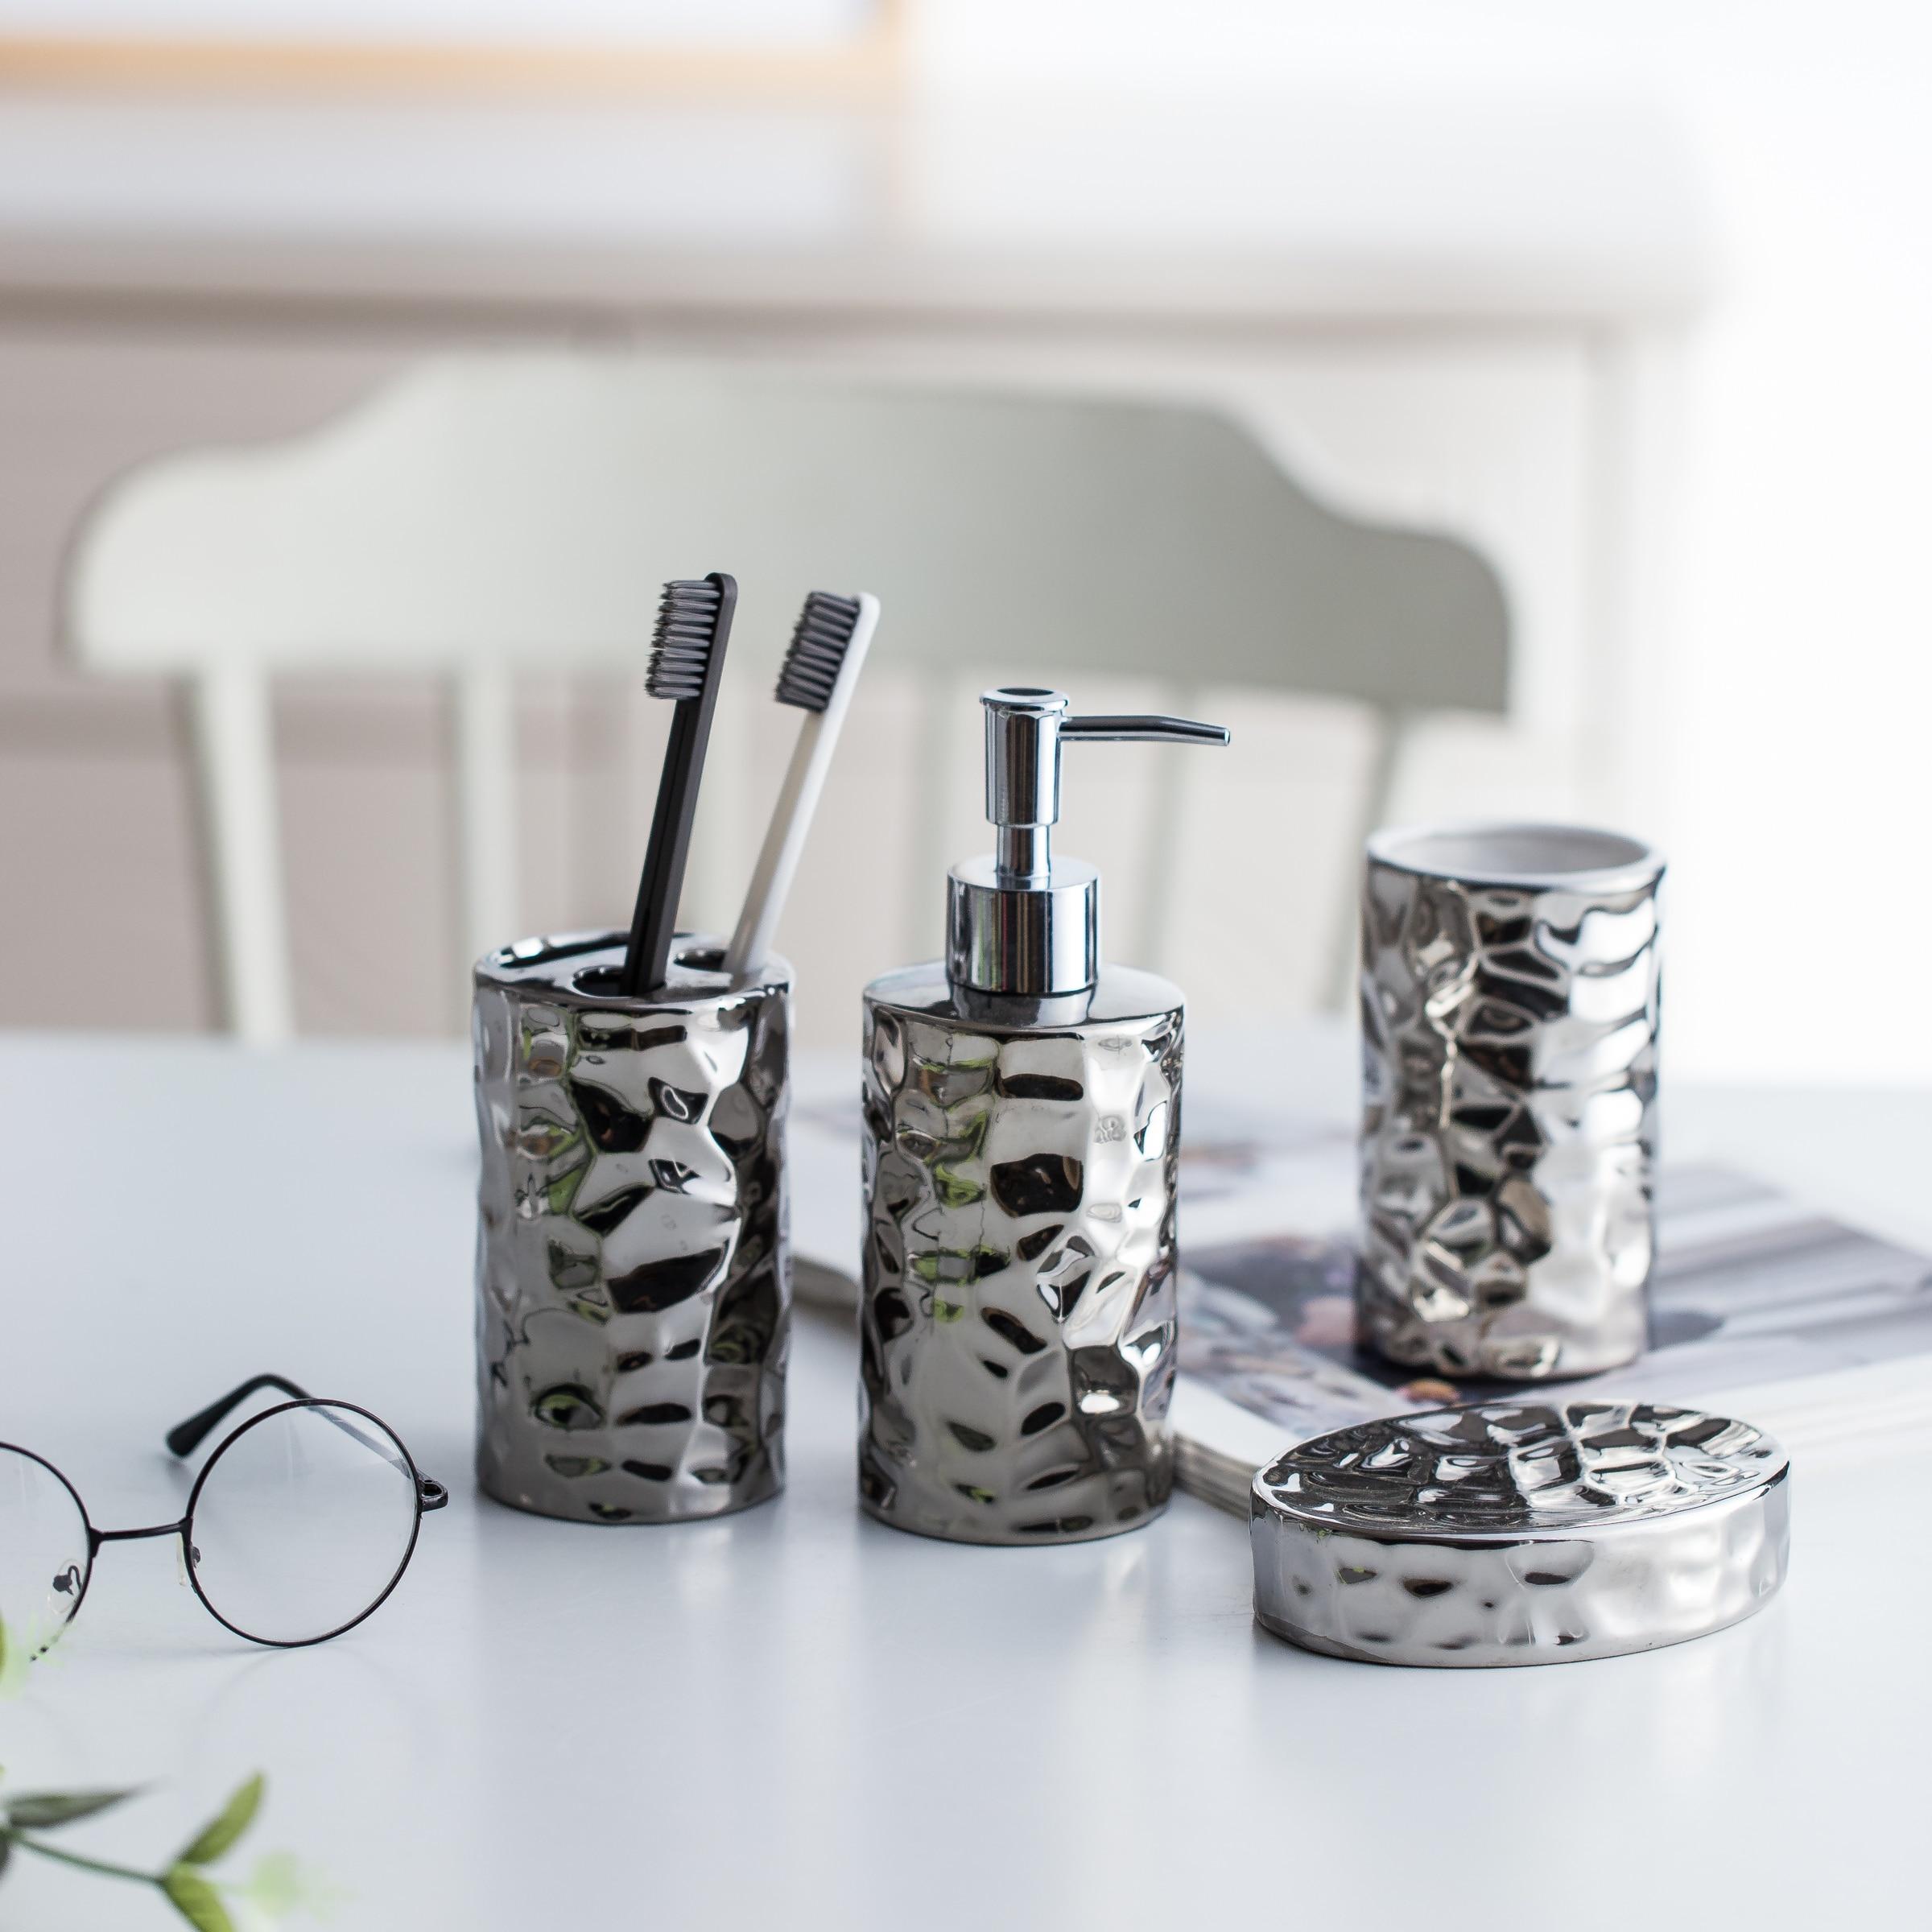 European style ceramic bathroom set silver plated washroom bathroom ...